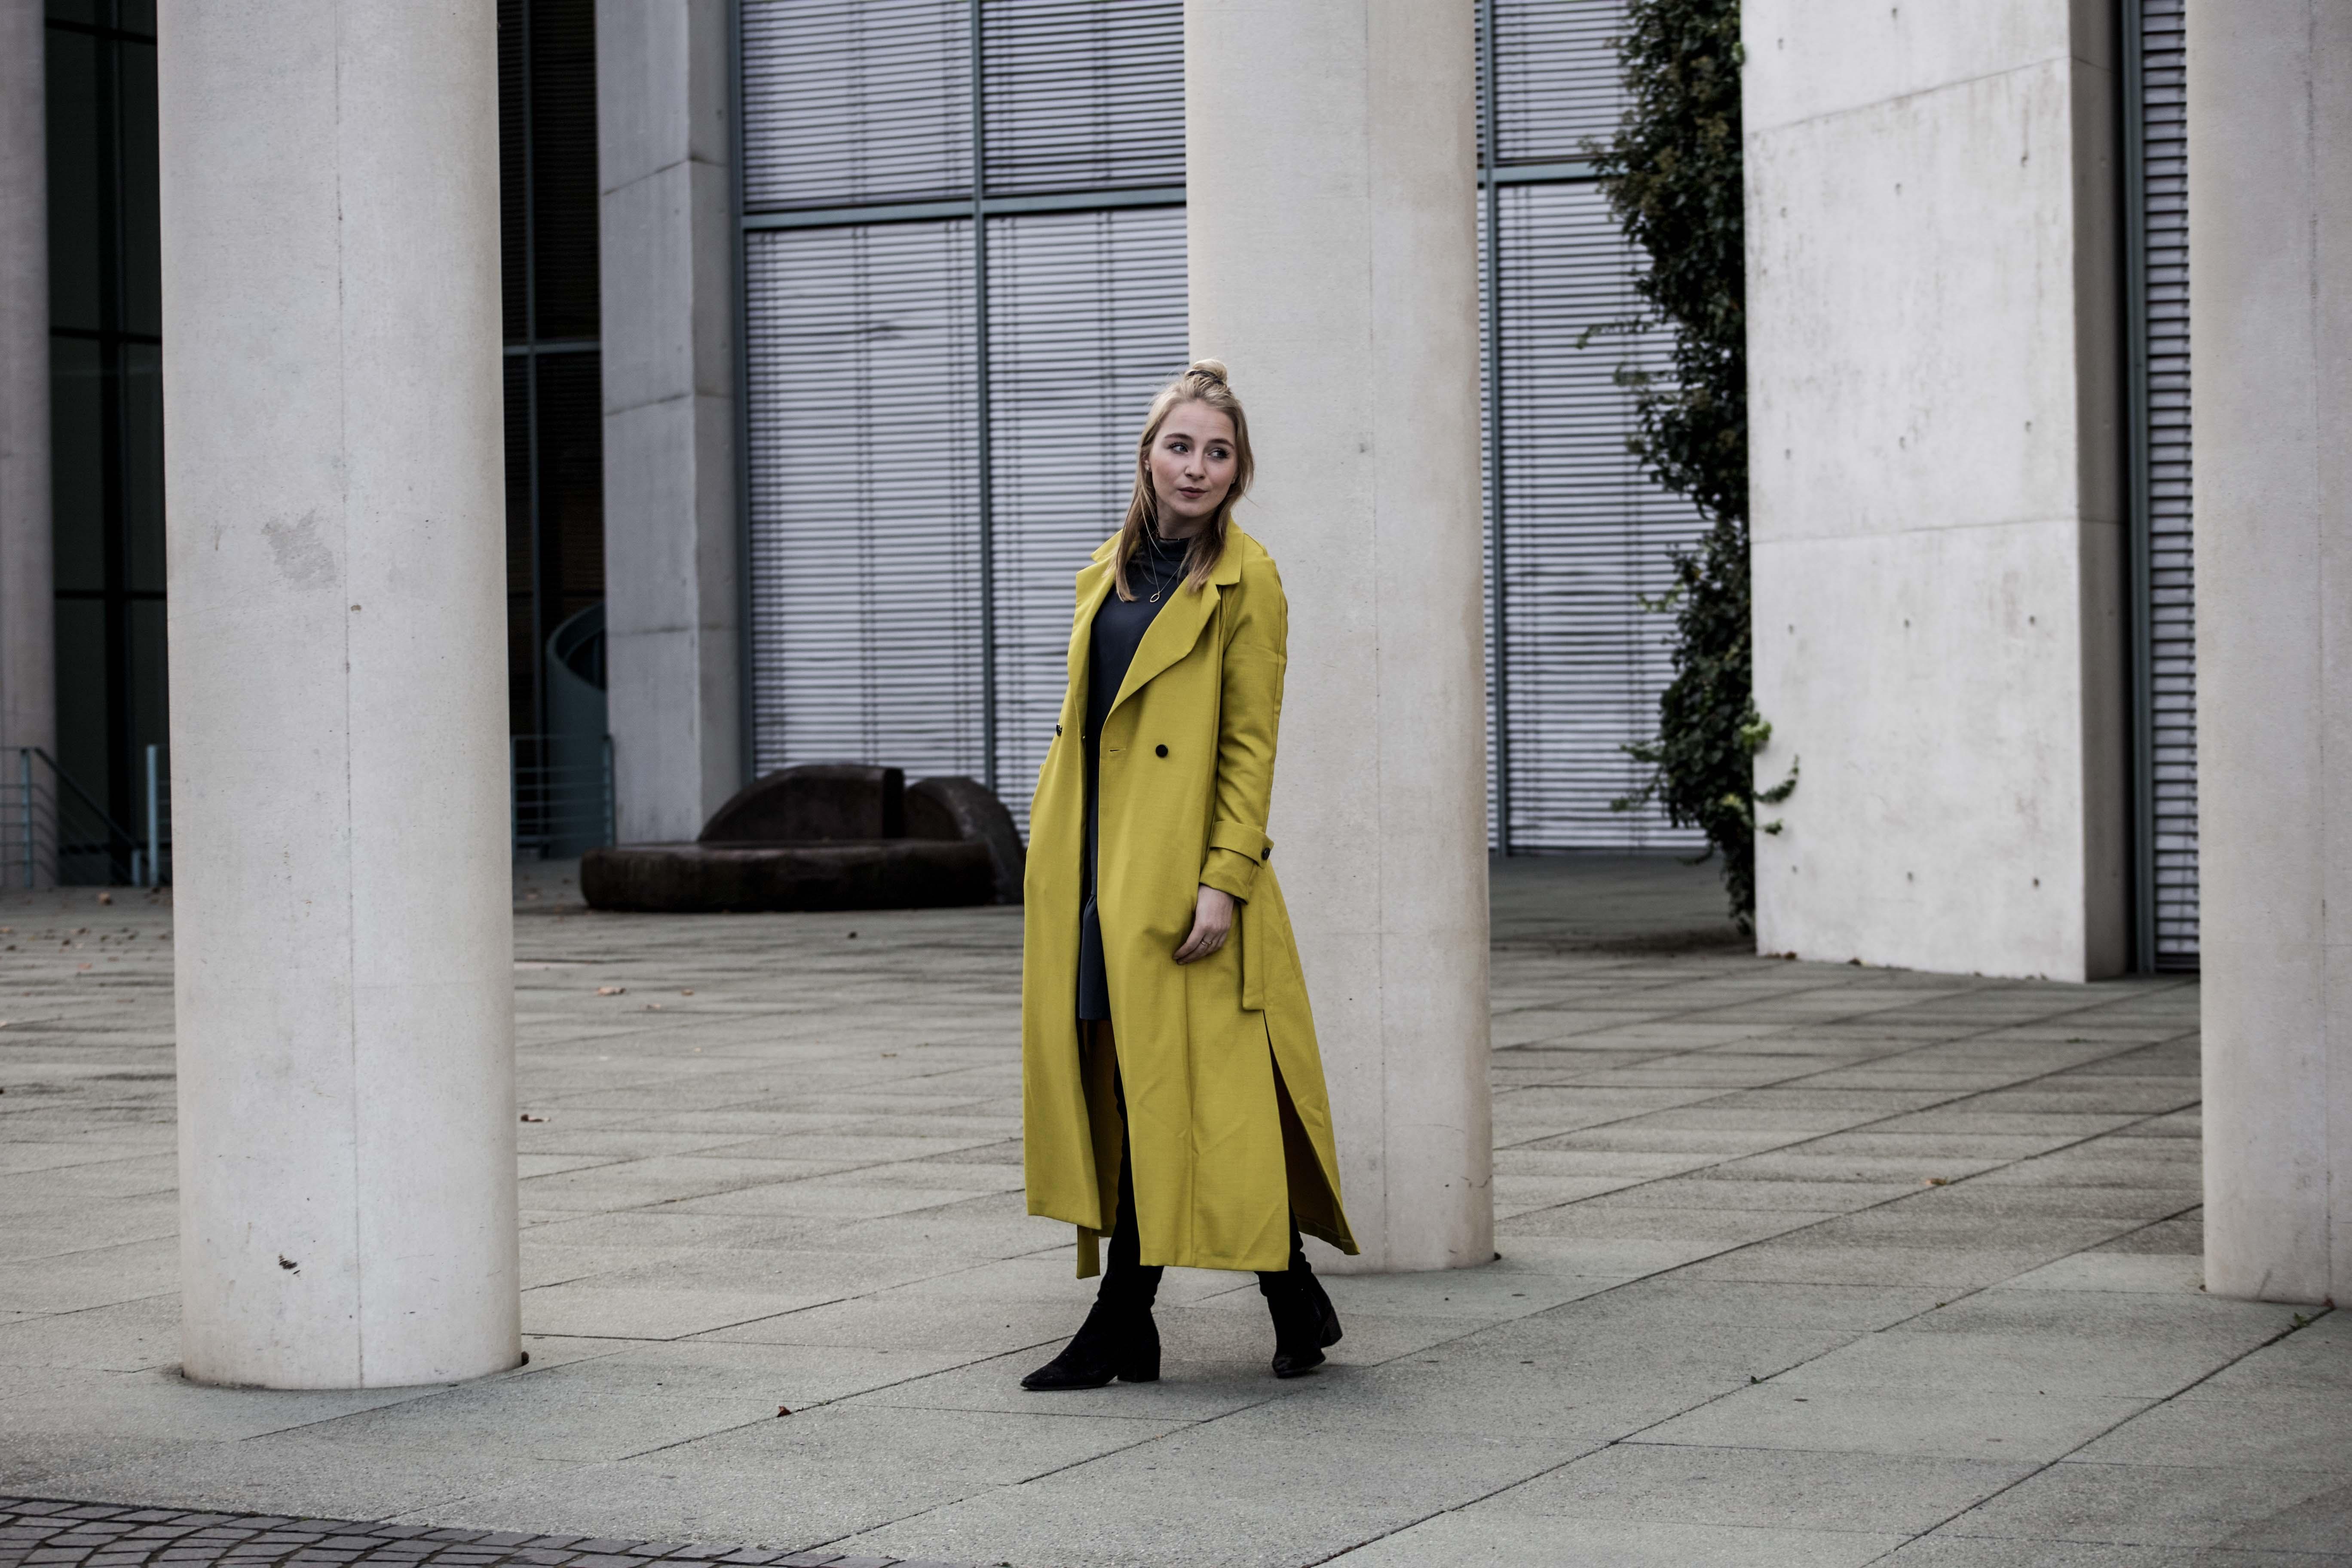 lemon-coat-volantkleid-herbstoutfit-fashionblog-modeblog-koeln-bonn-berlin_8086